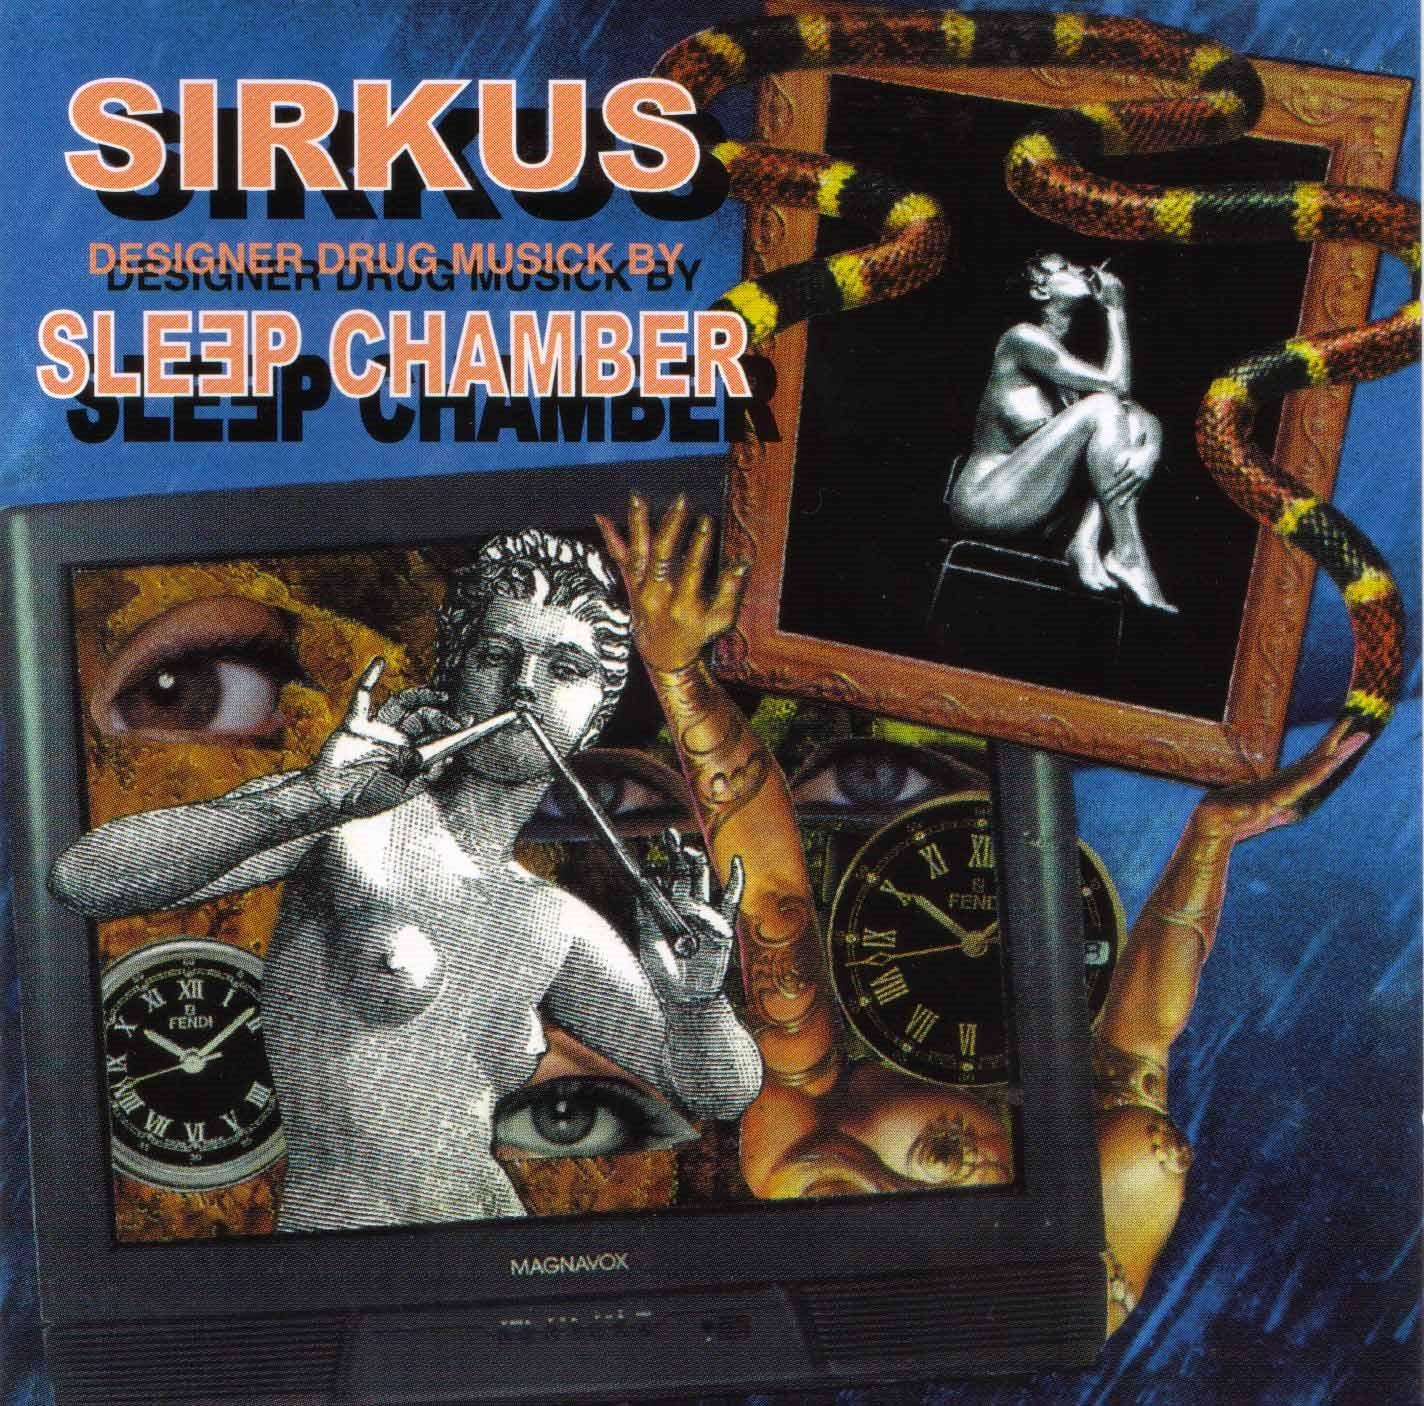 обложка альбома Sirkus группы Sleep Chamber